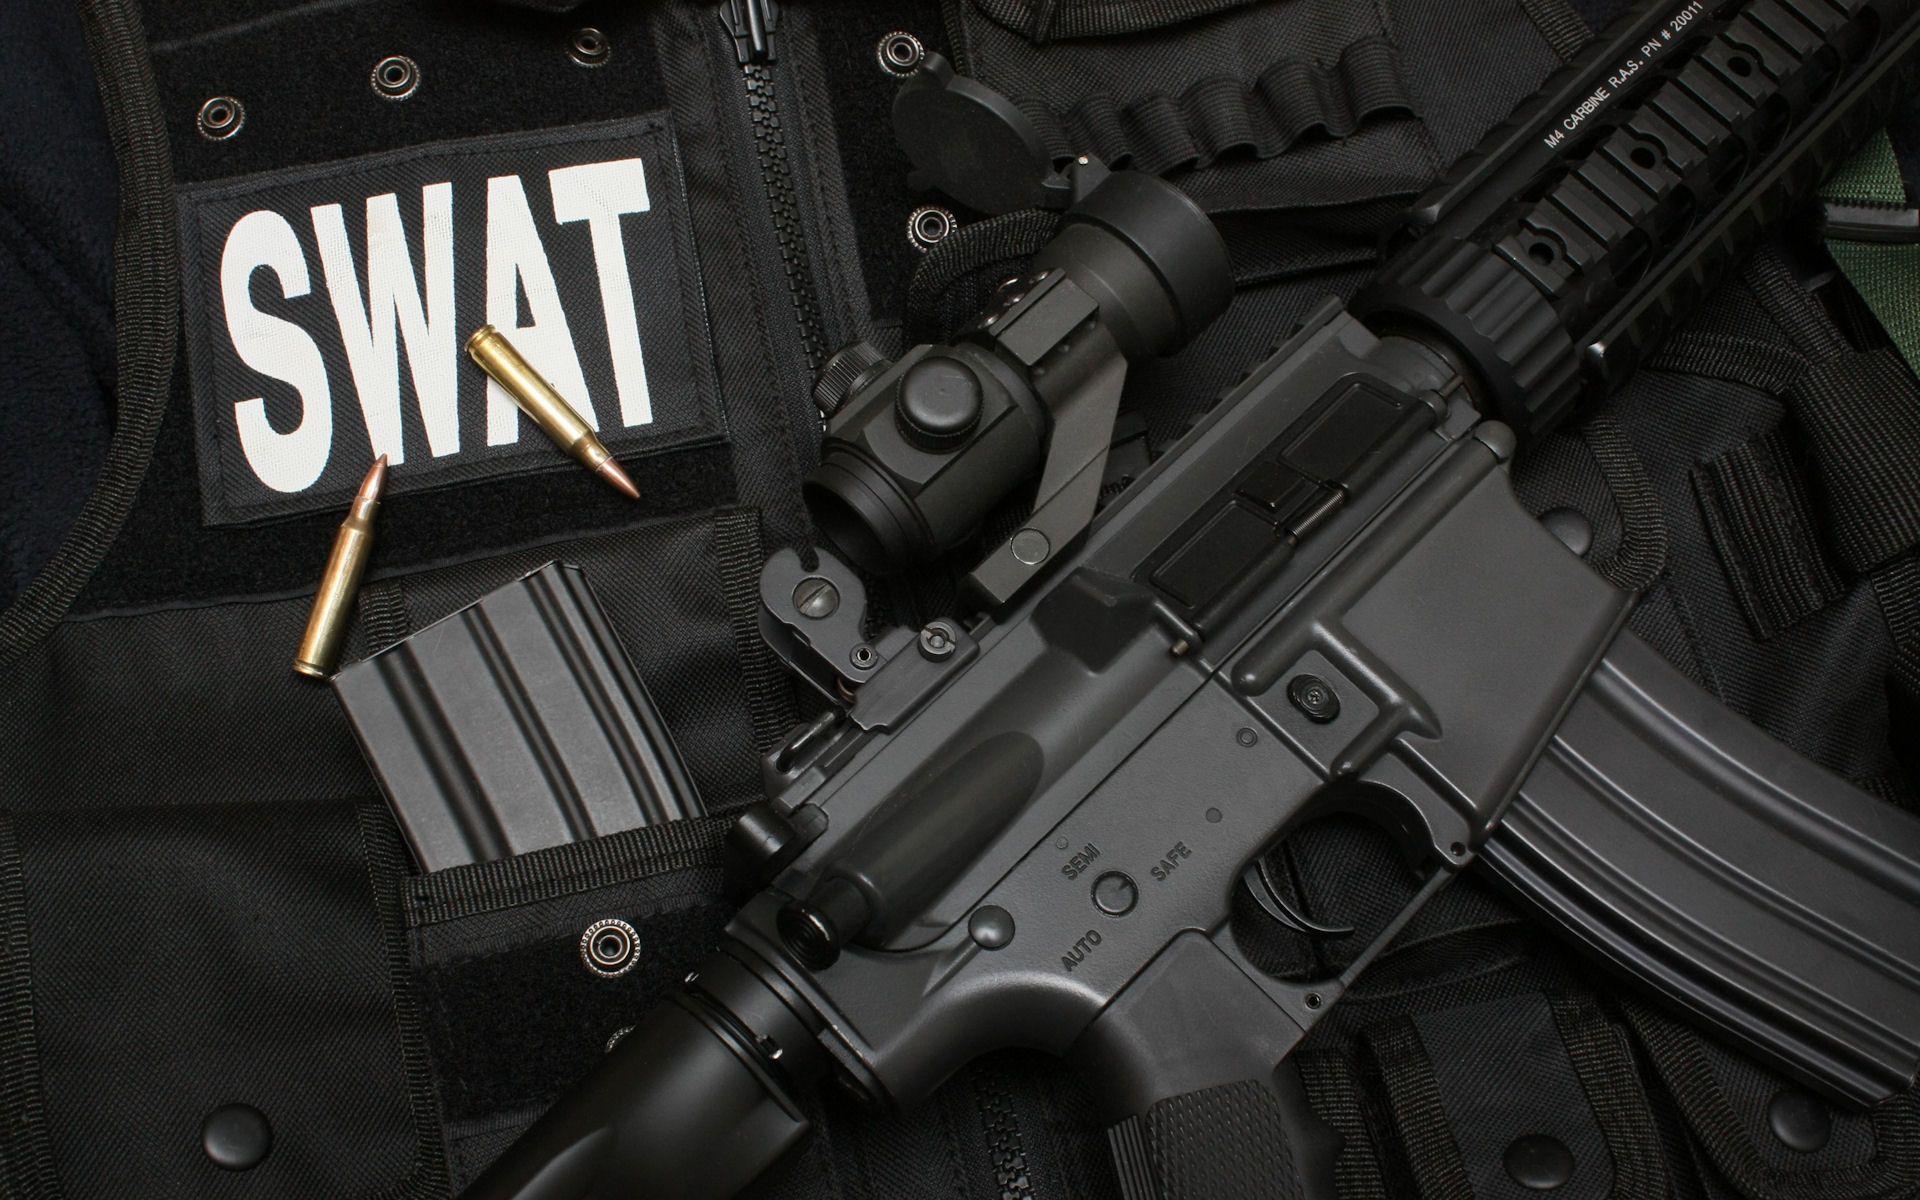 sniper rifel hd wallpaper nono swat guns wallpaper